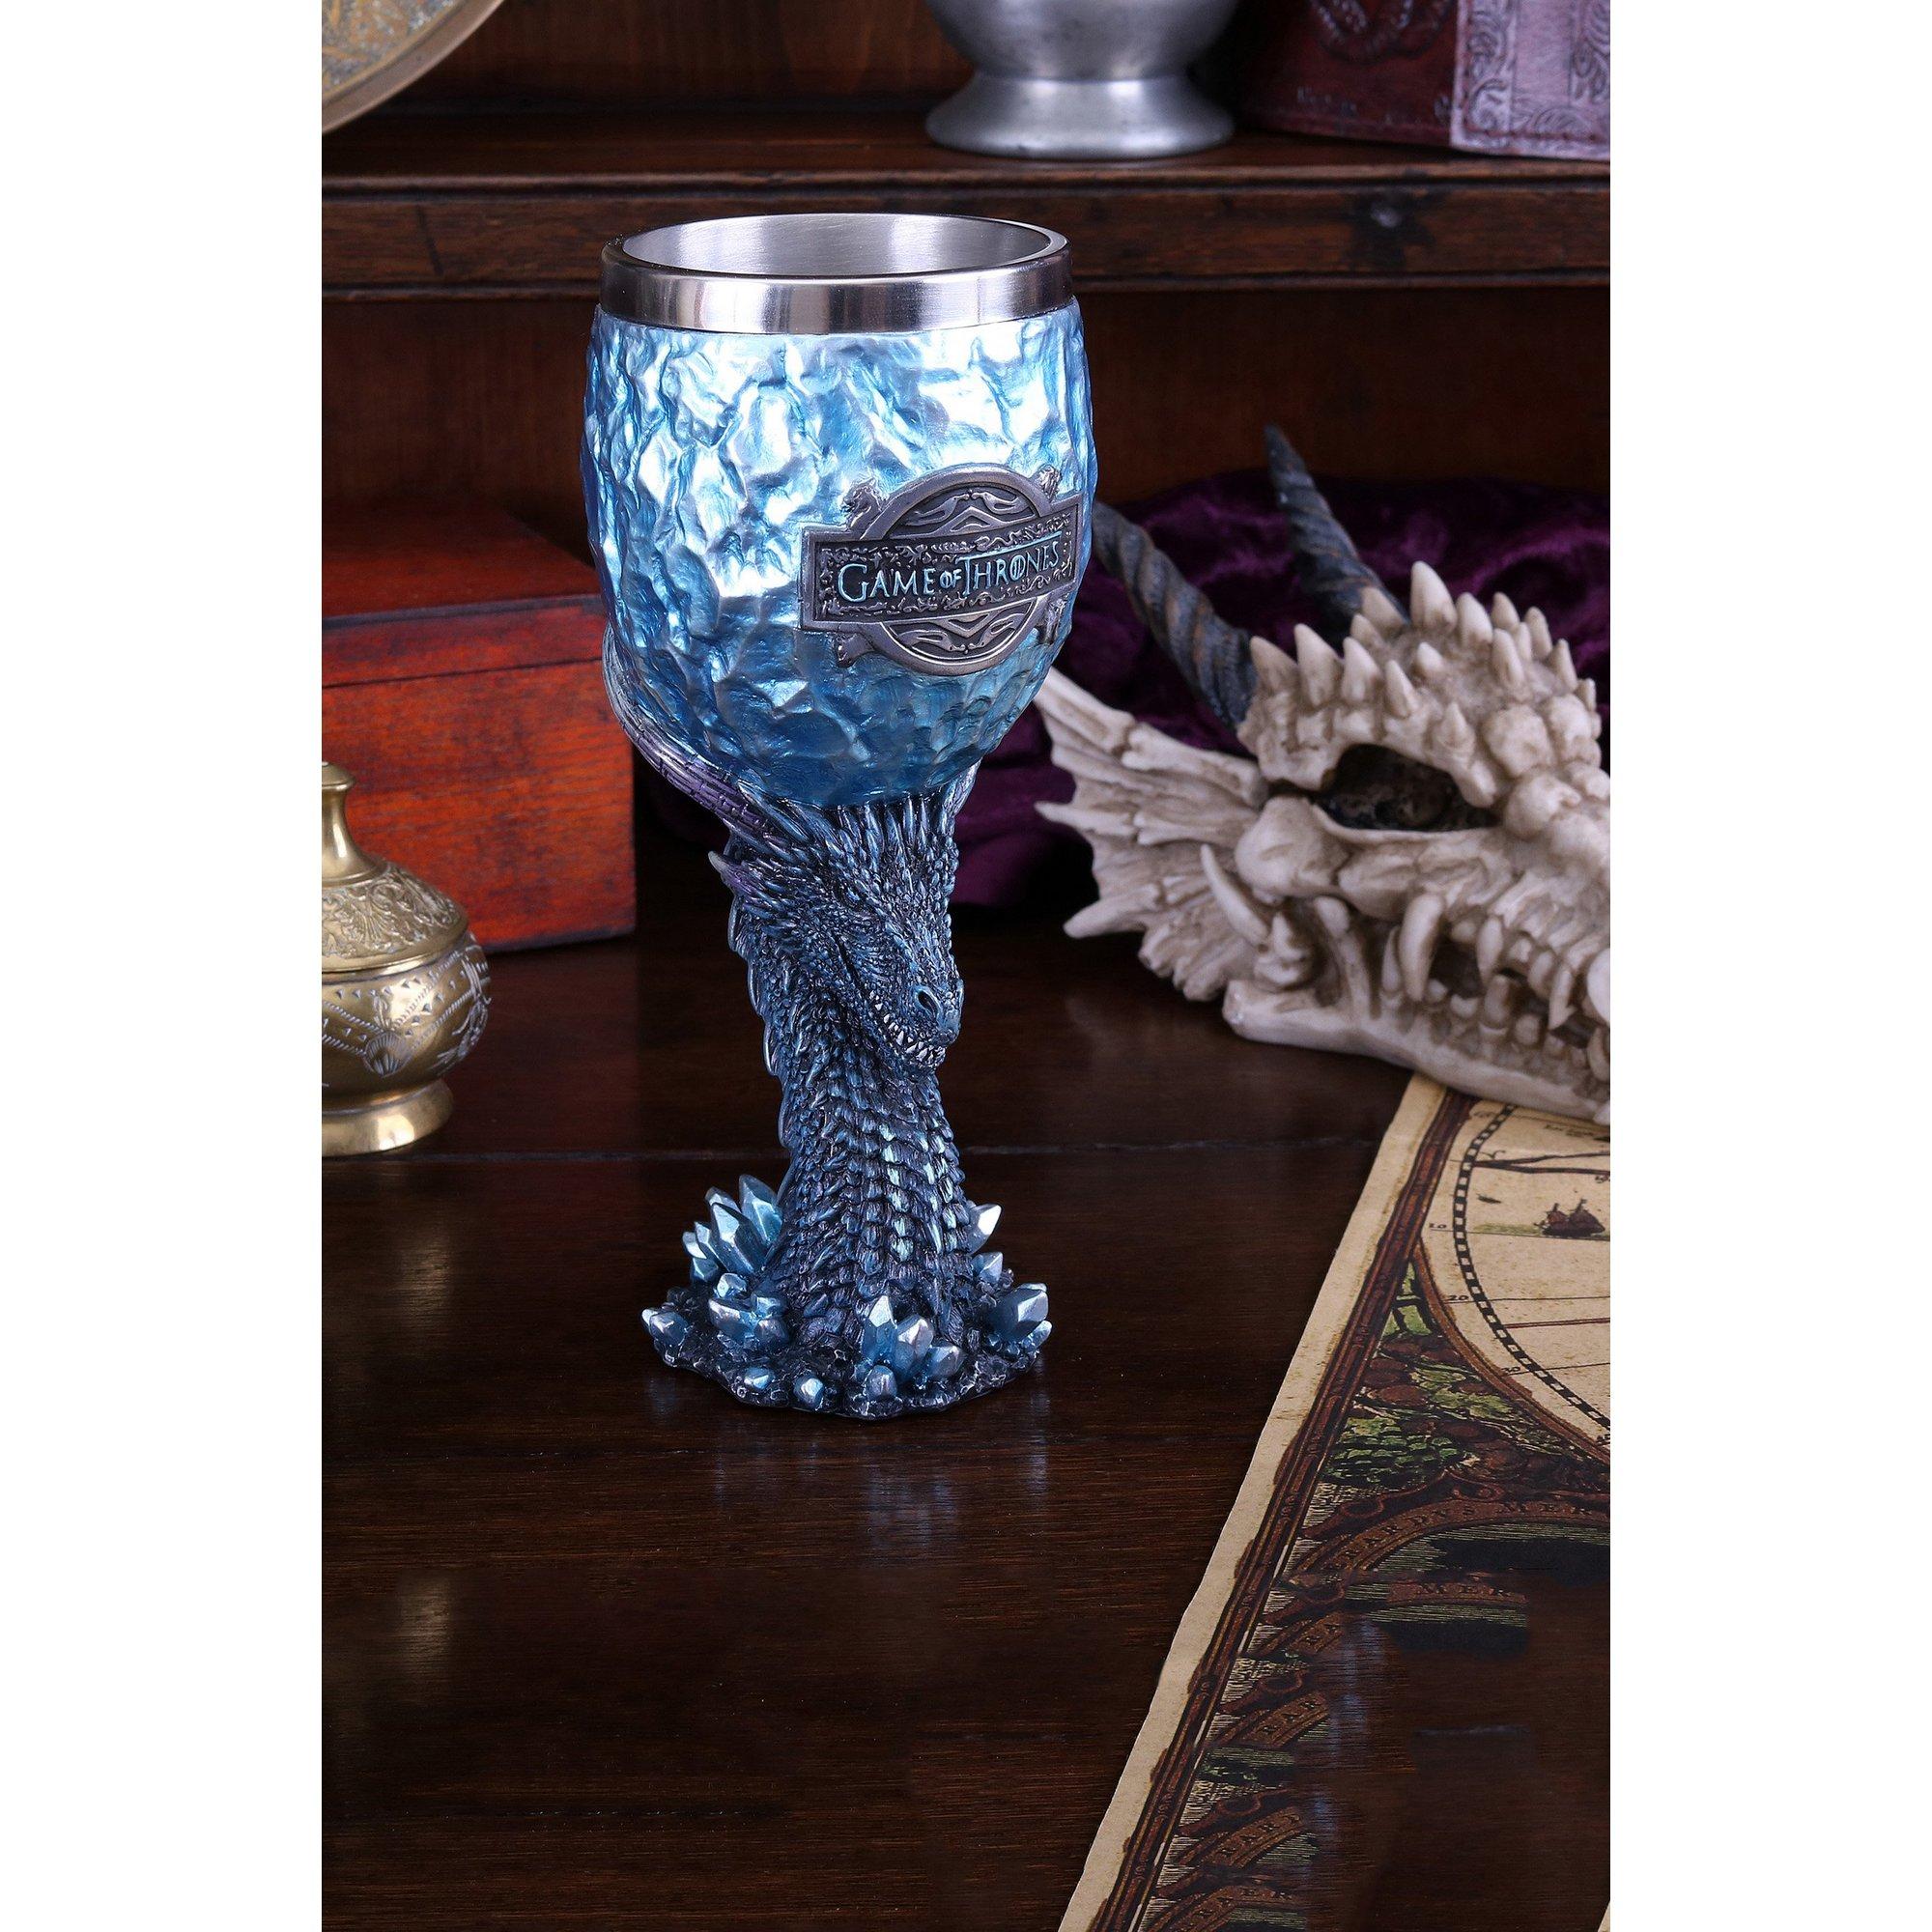 Image of Game of Thrones Viserion White Walker Goblet